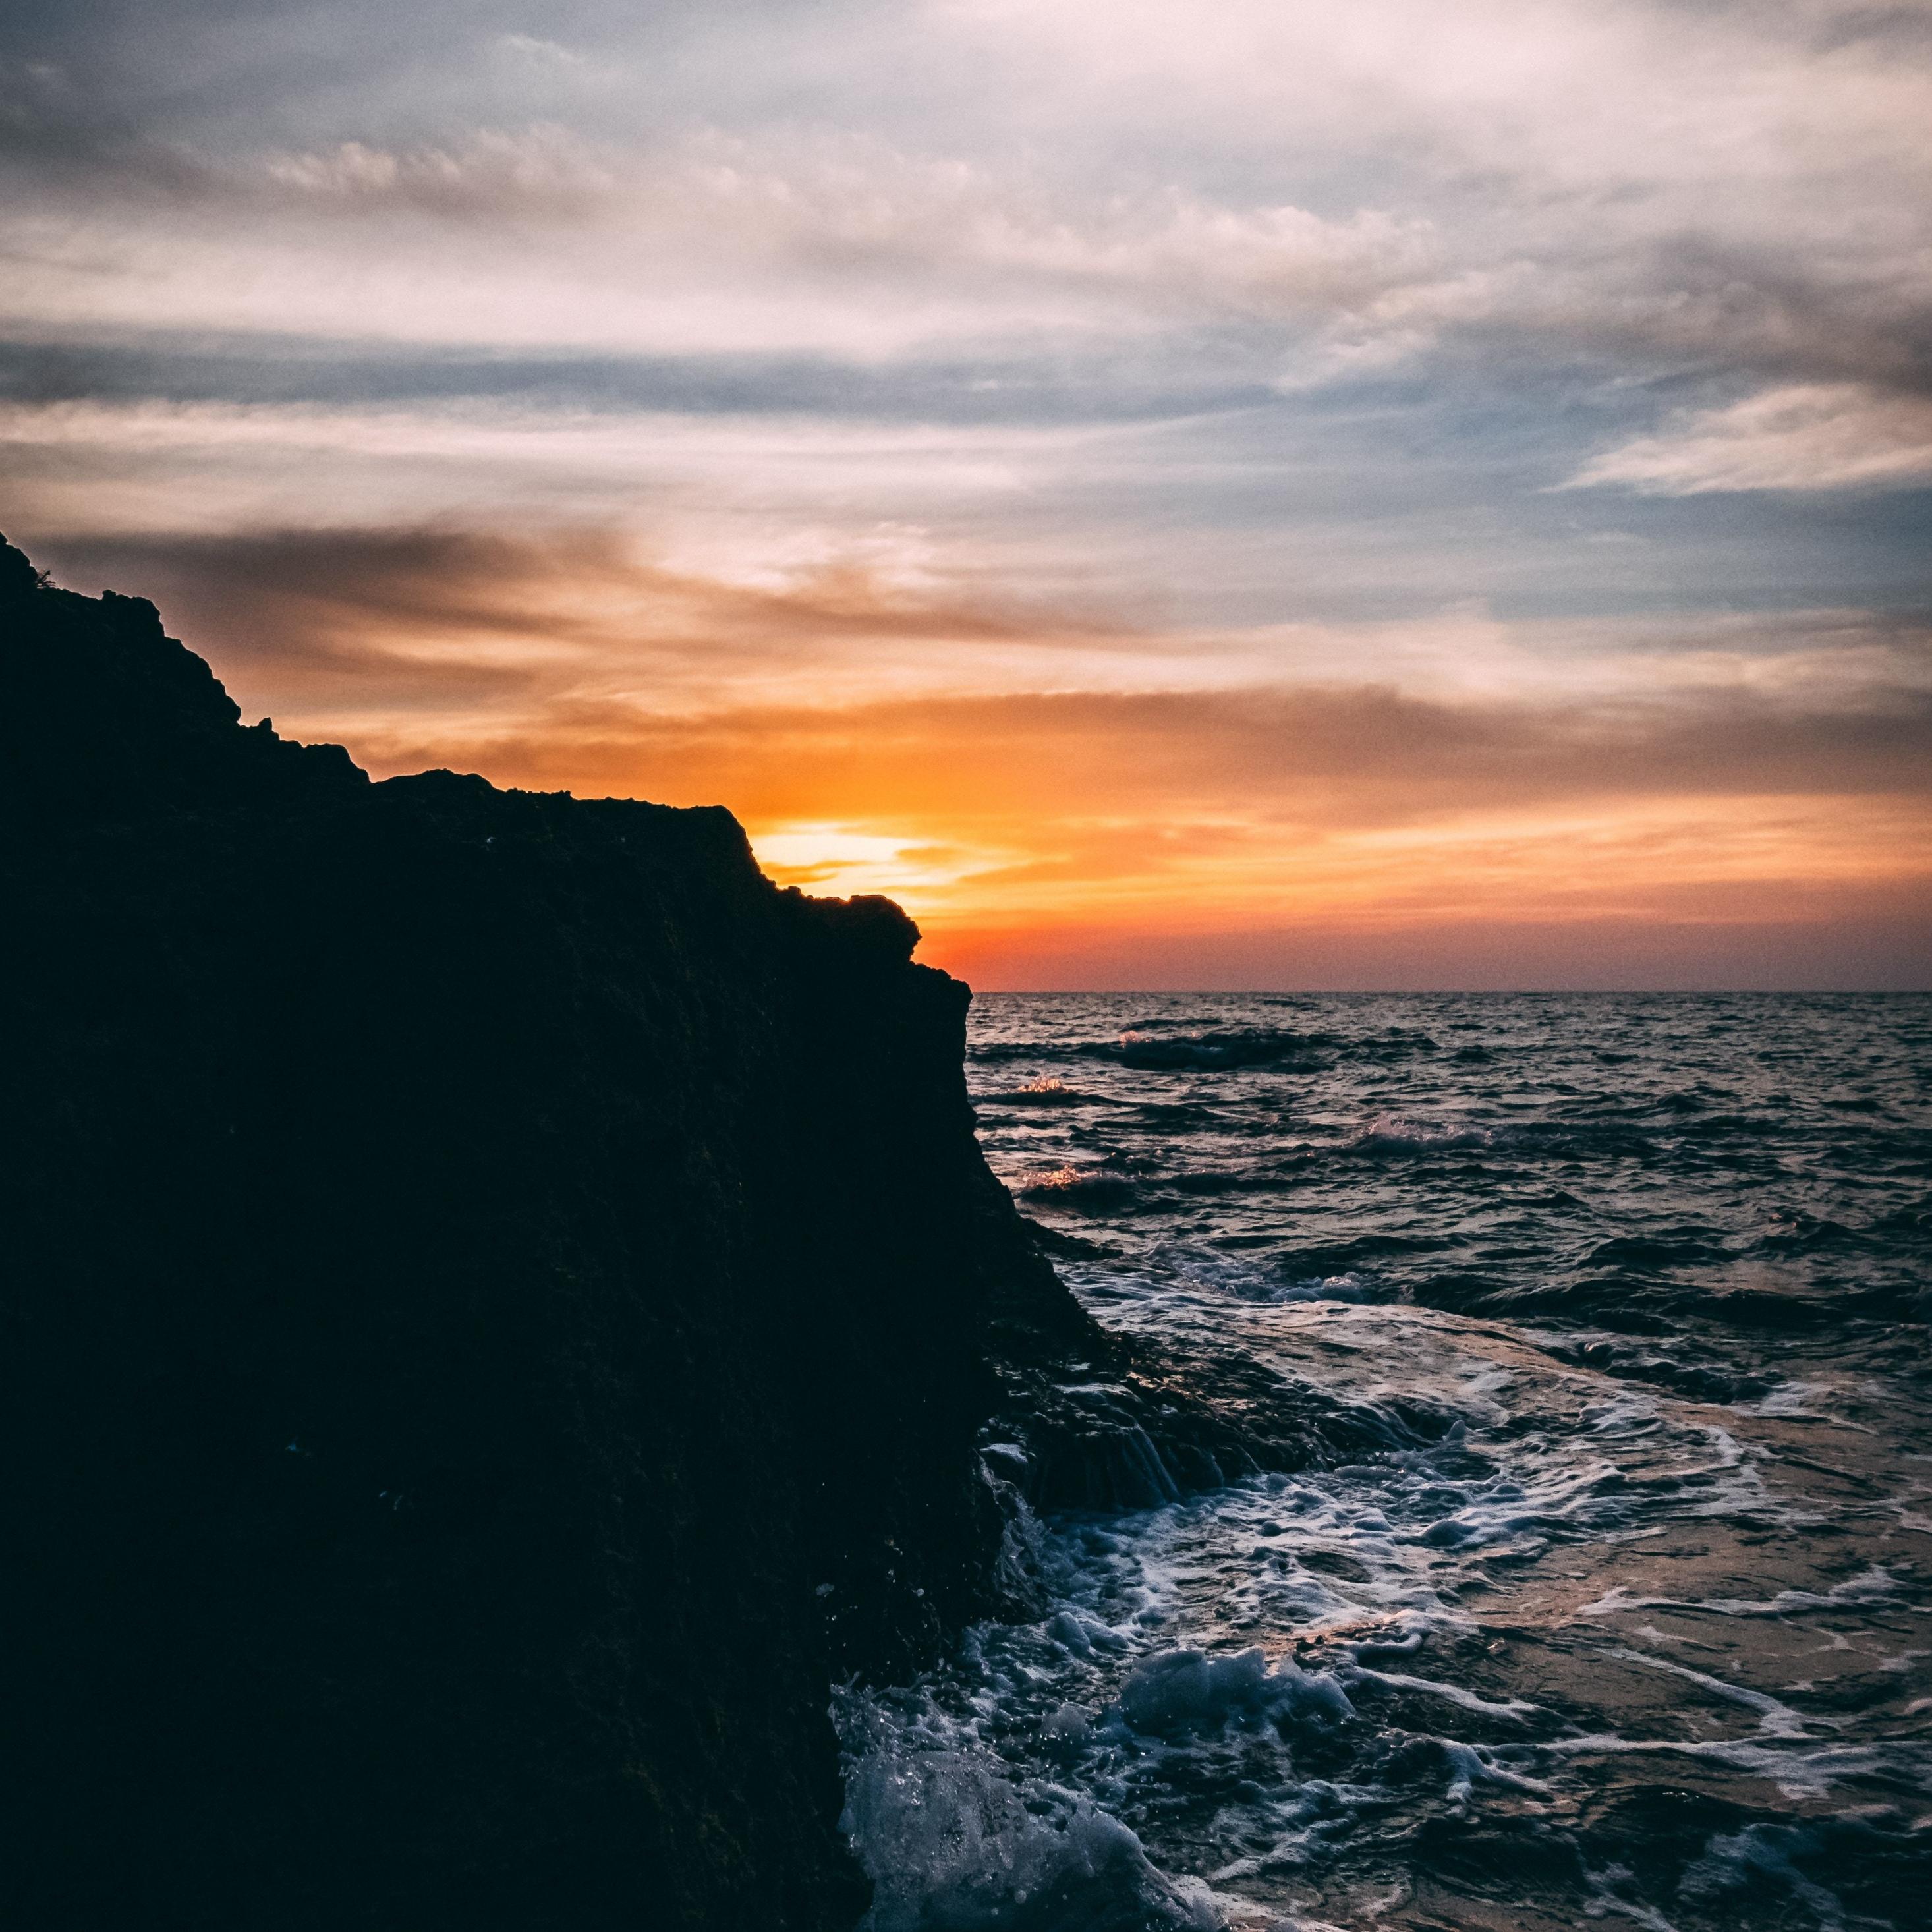 Download 2932x2932 Wallpaper Sunset Coast Rocks Sea Nature